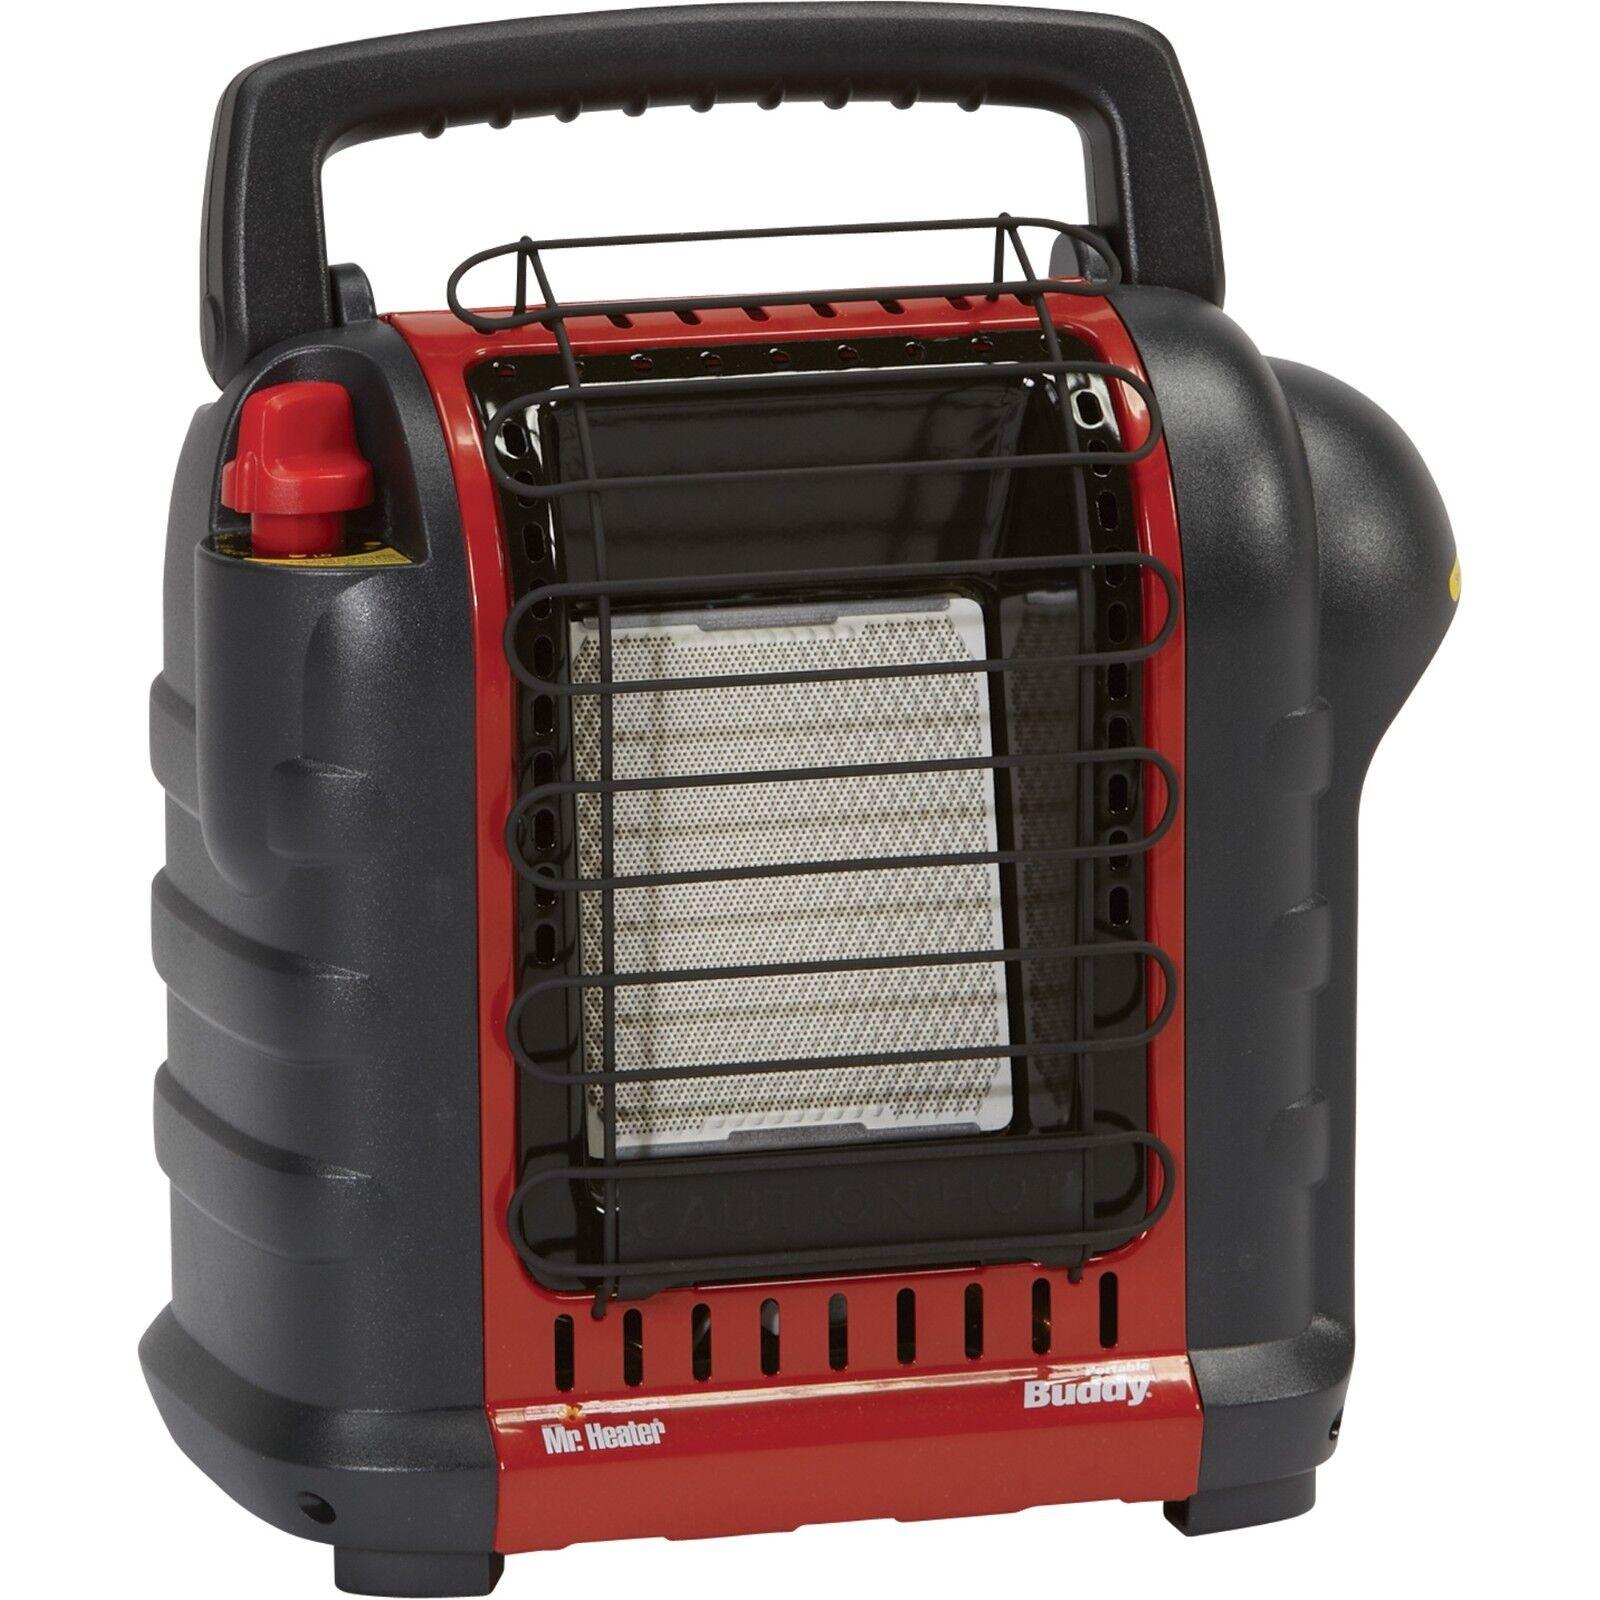 New Mr Heater Mf232000 Portable Buddy Mh9bx 89301320000